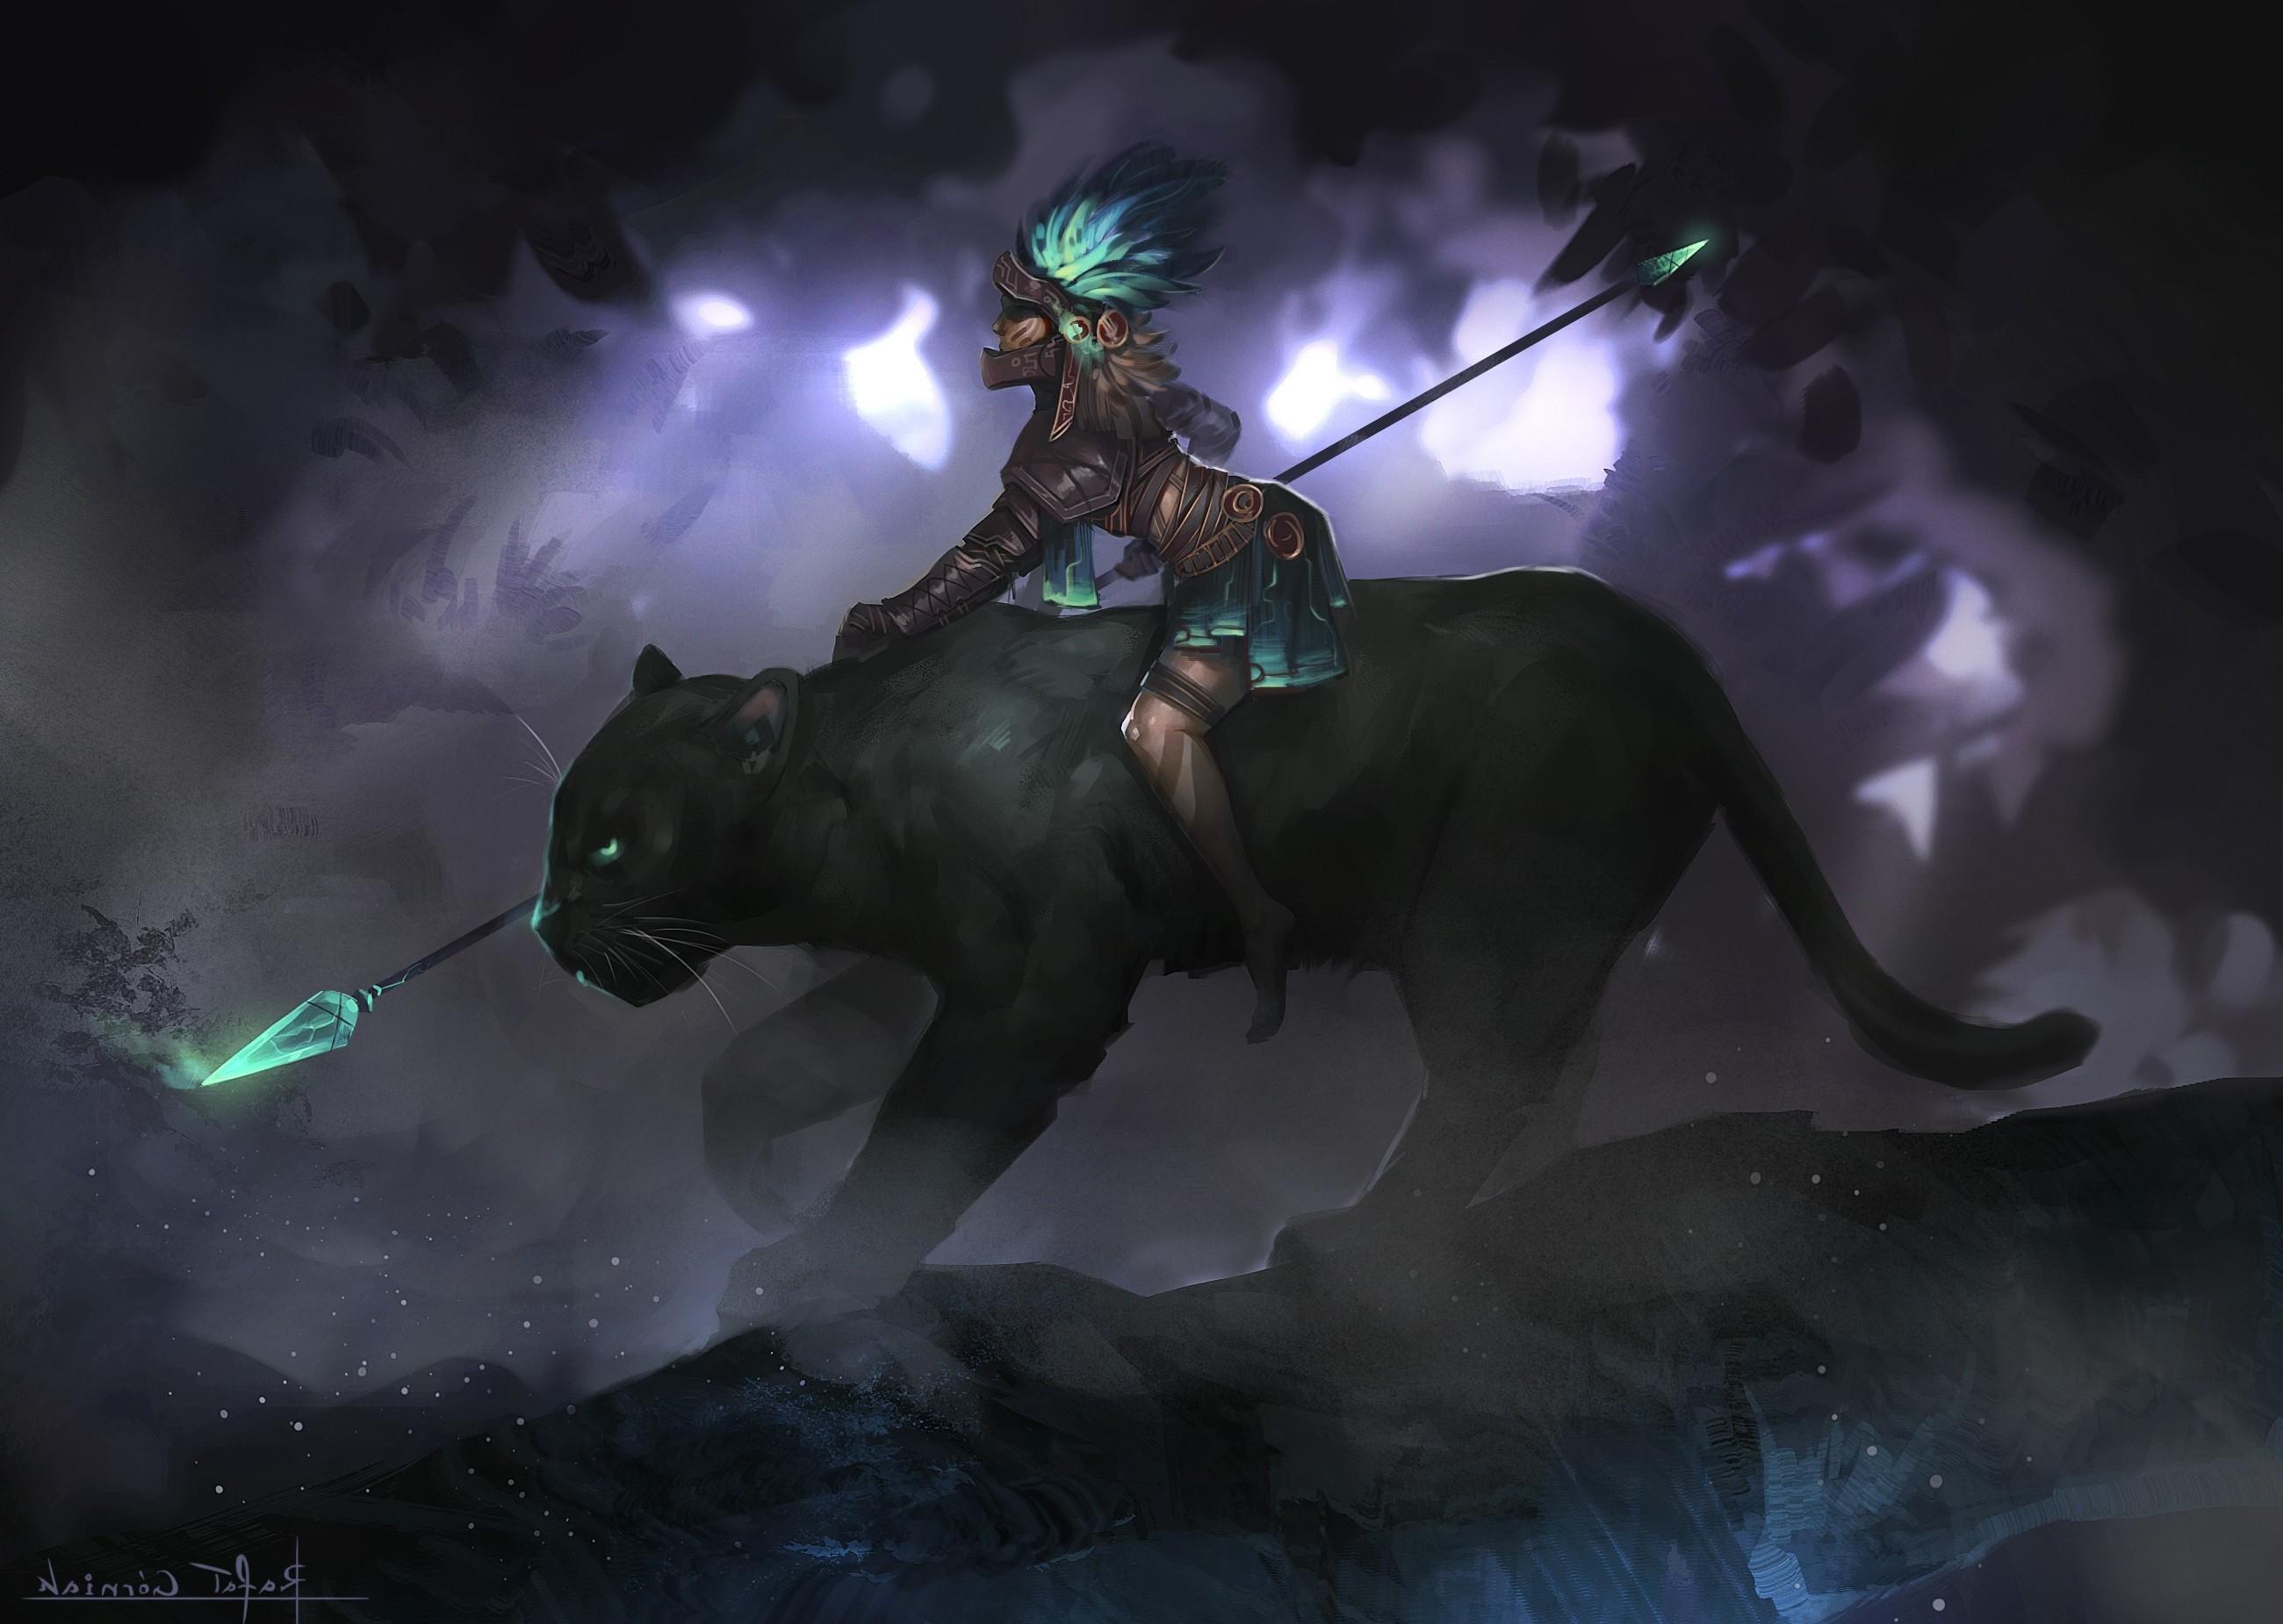 fantasy Art, Warrior, Smite, Awilix Wallpapers HD .